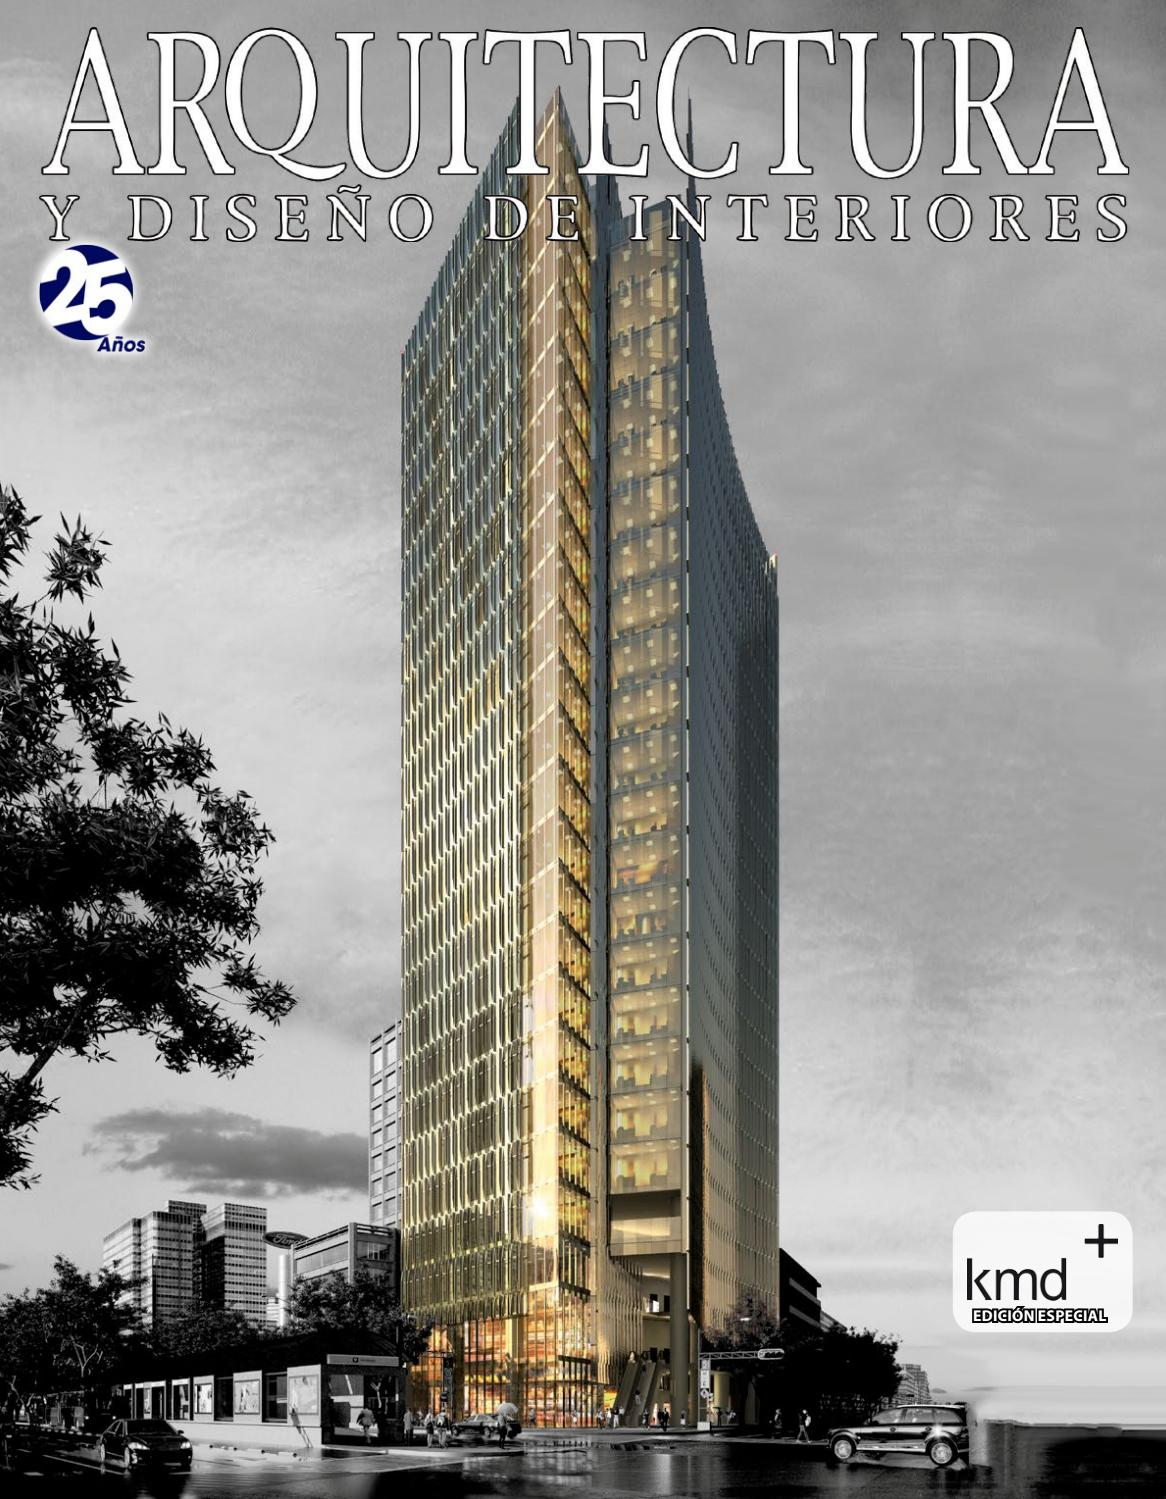 Arquitectura y dise o de interiores 102 ed kmd by - Diseno y arquitectura de interiores ...